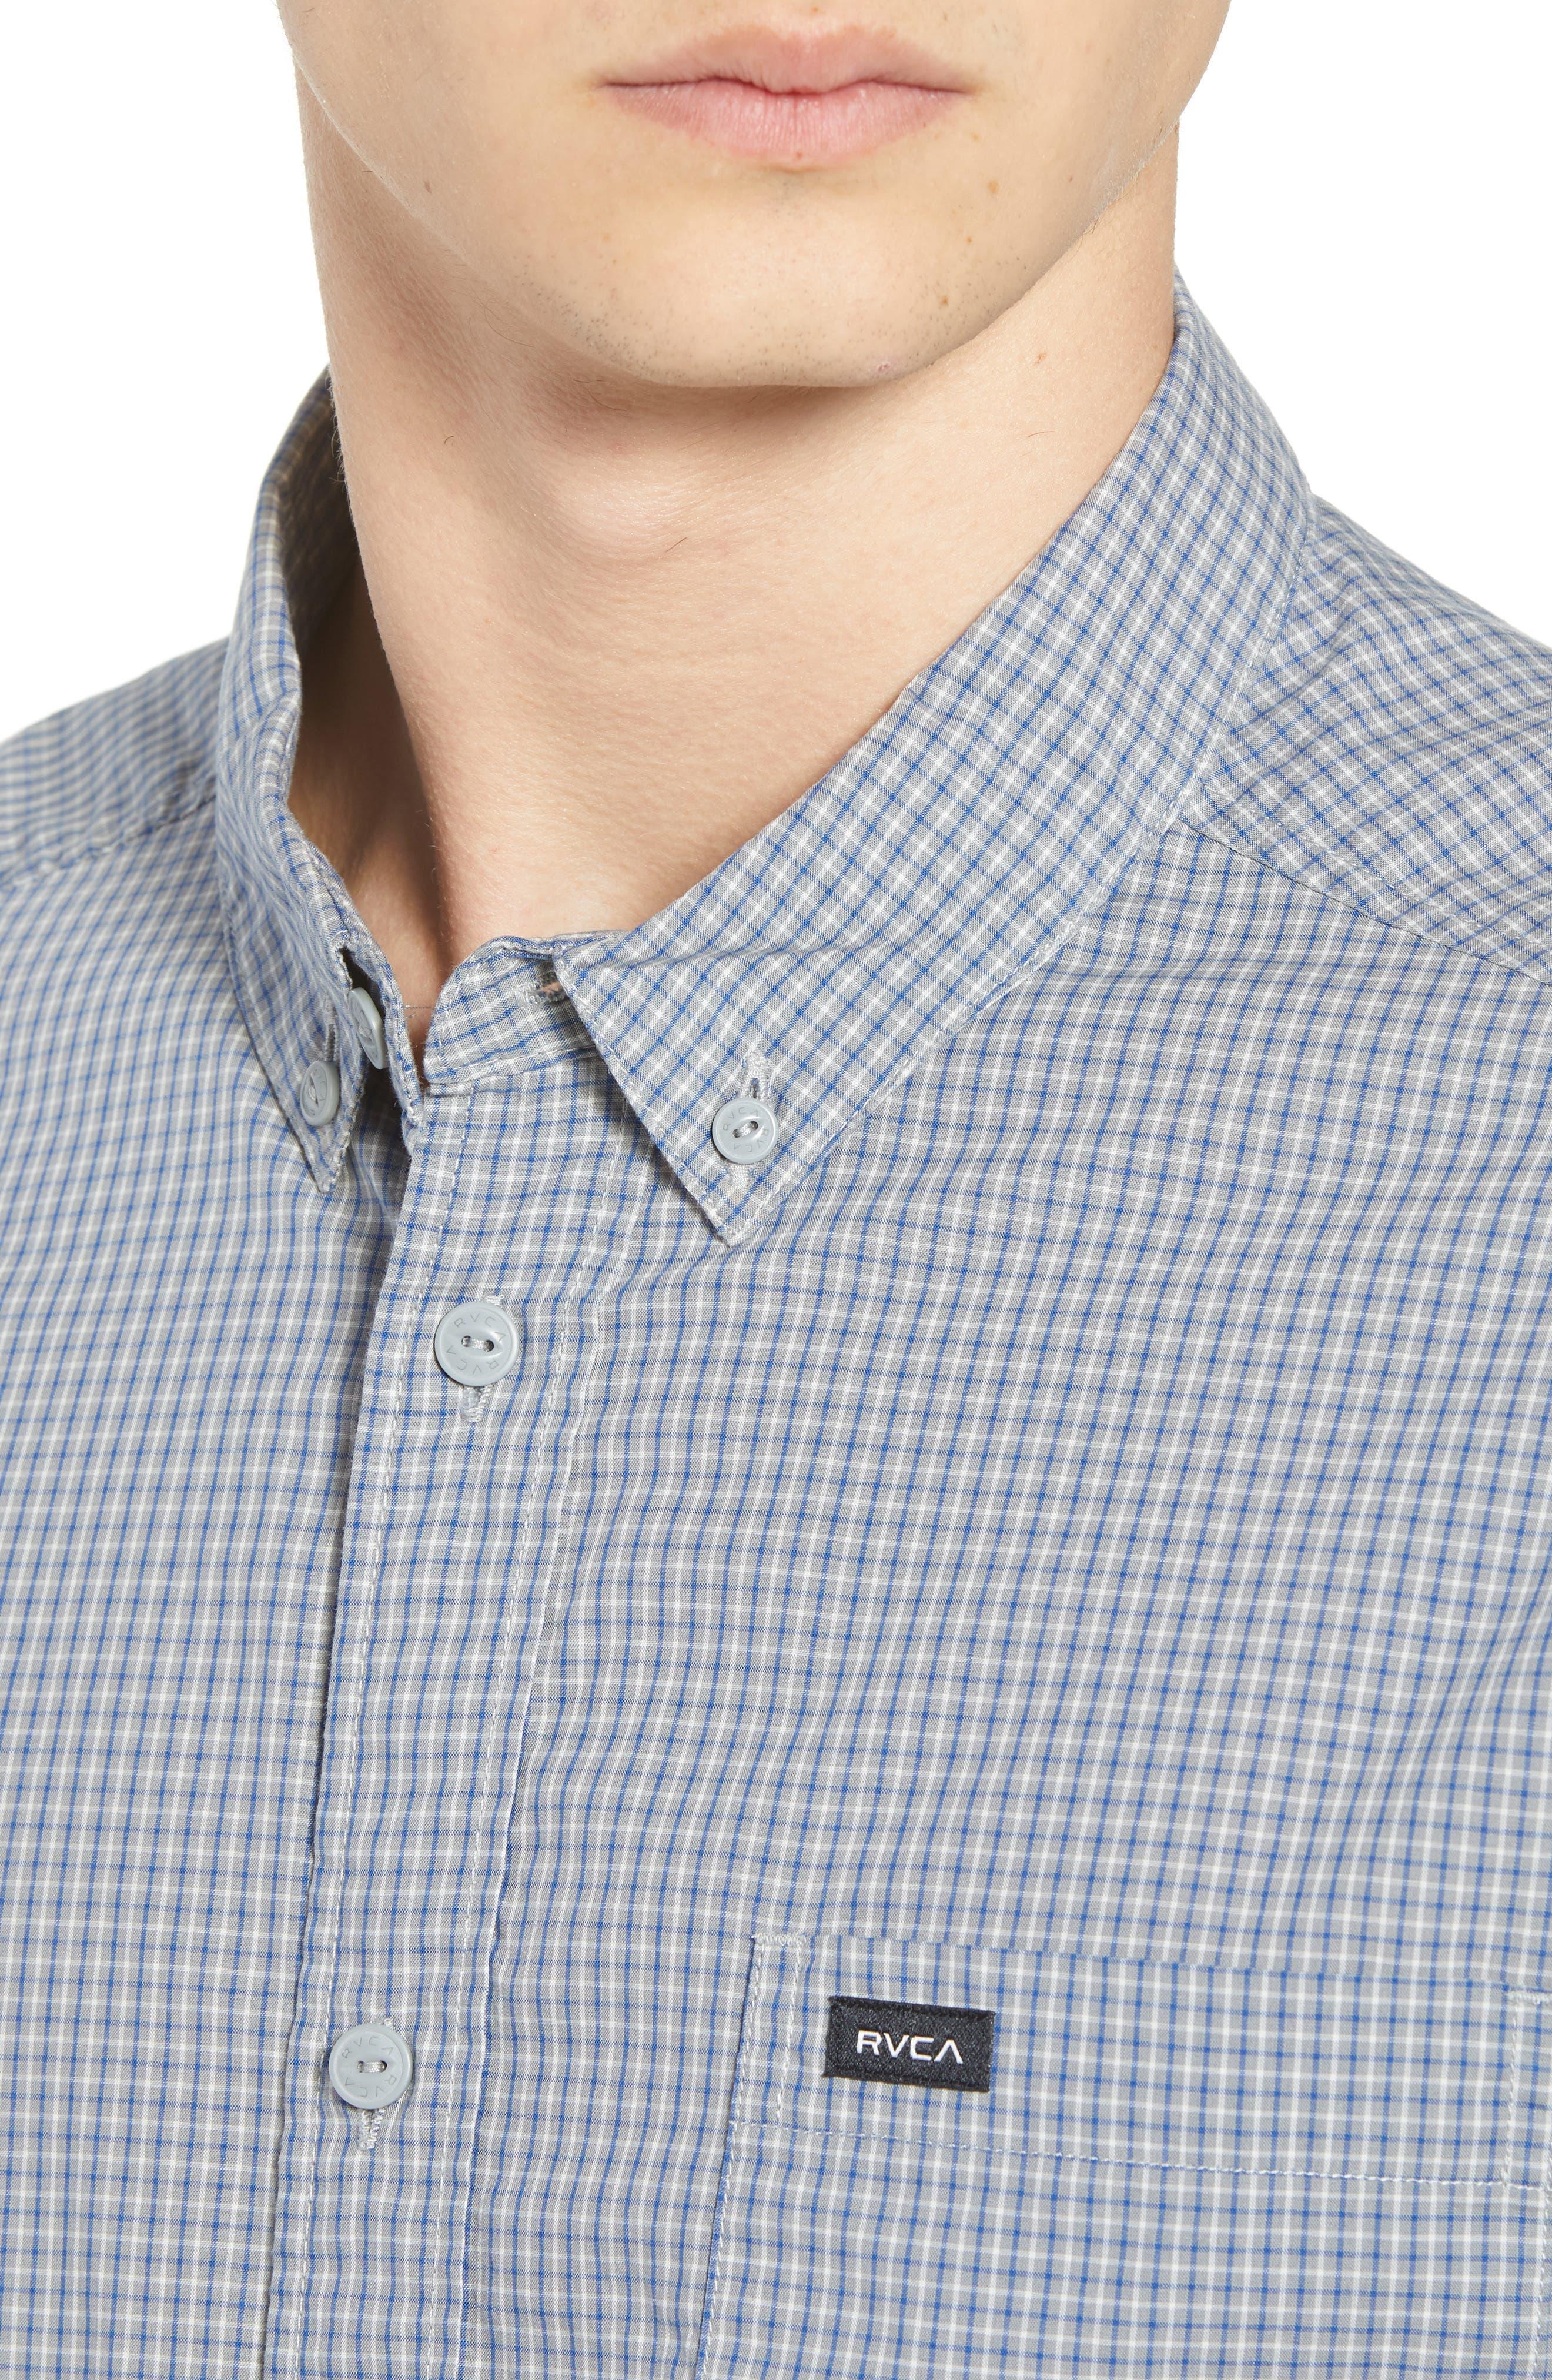 Staple Woven Shirt,                             Alternate thumbnail 4, color,                             026